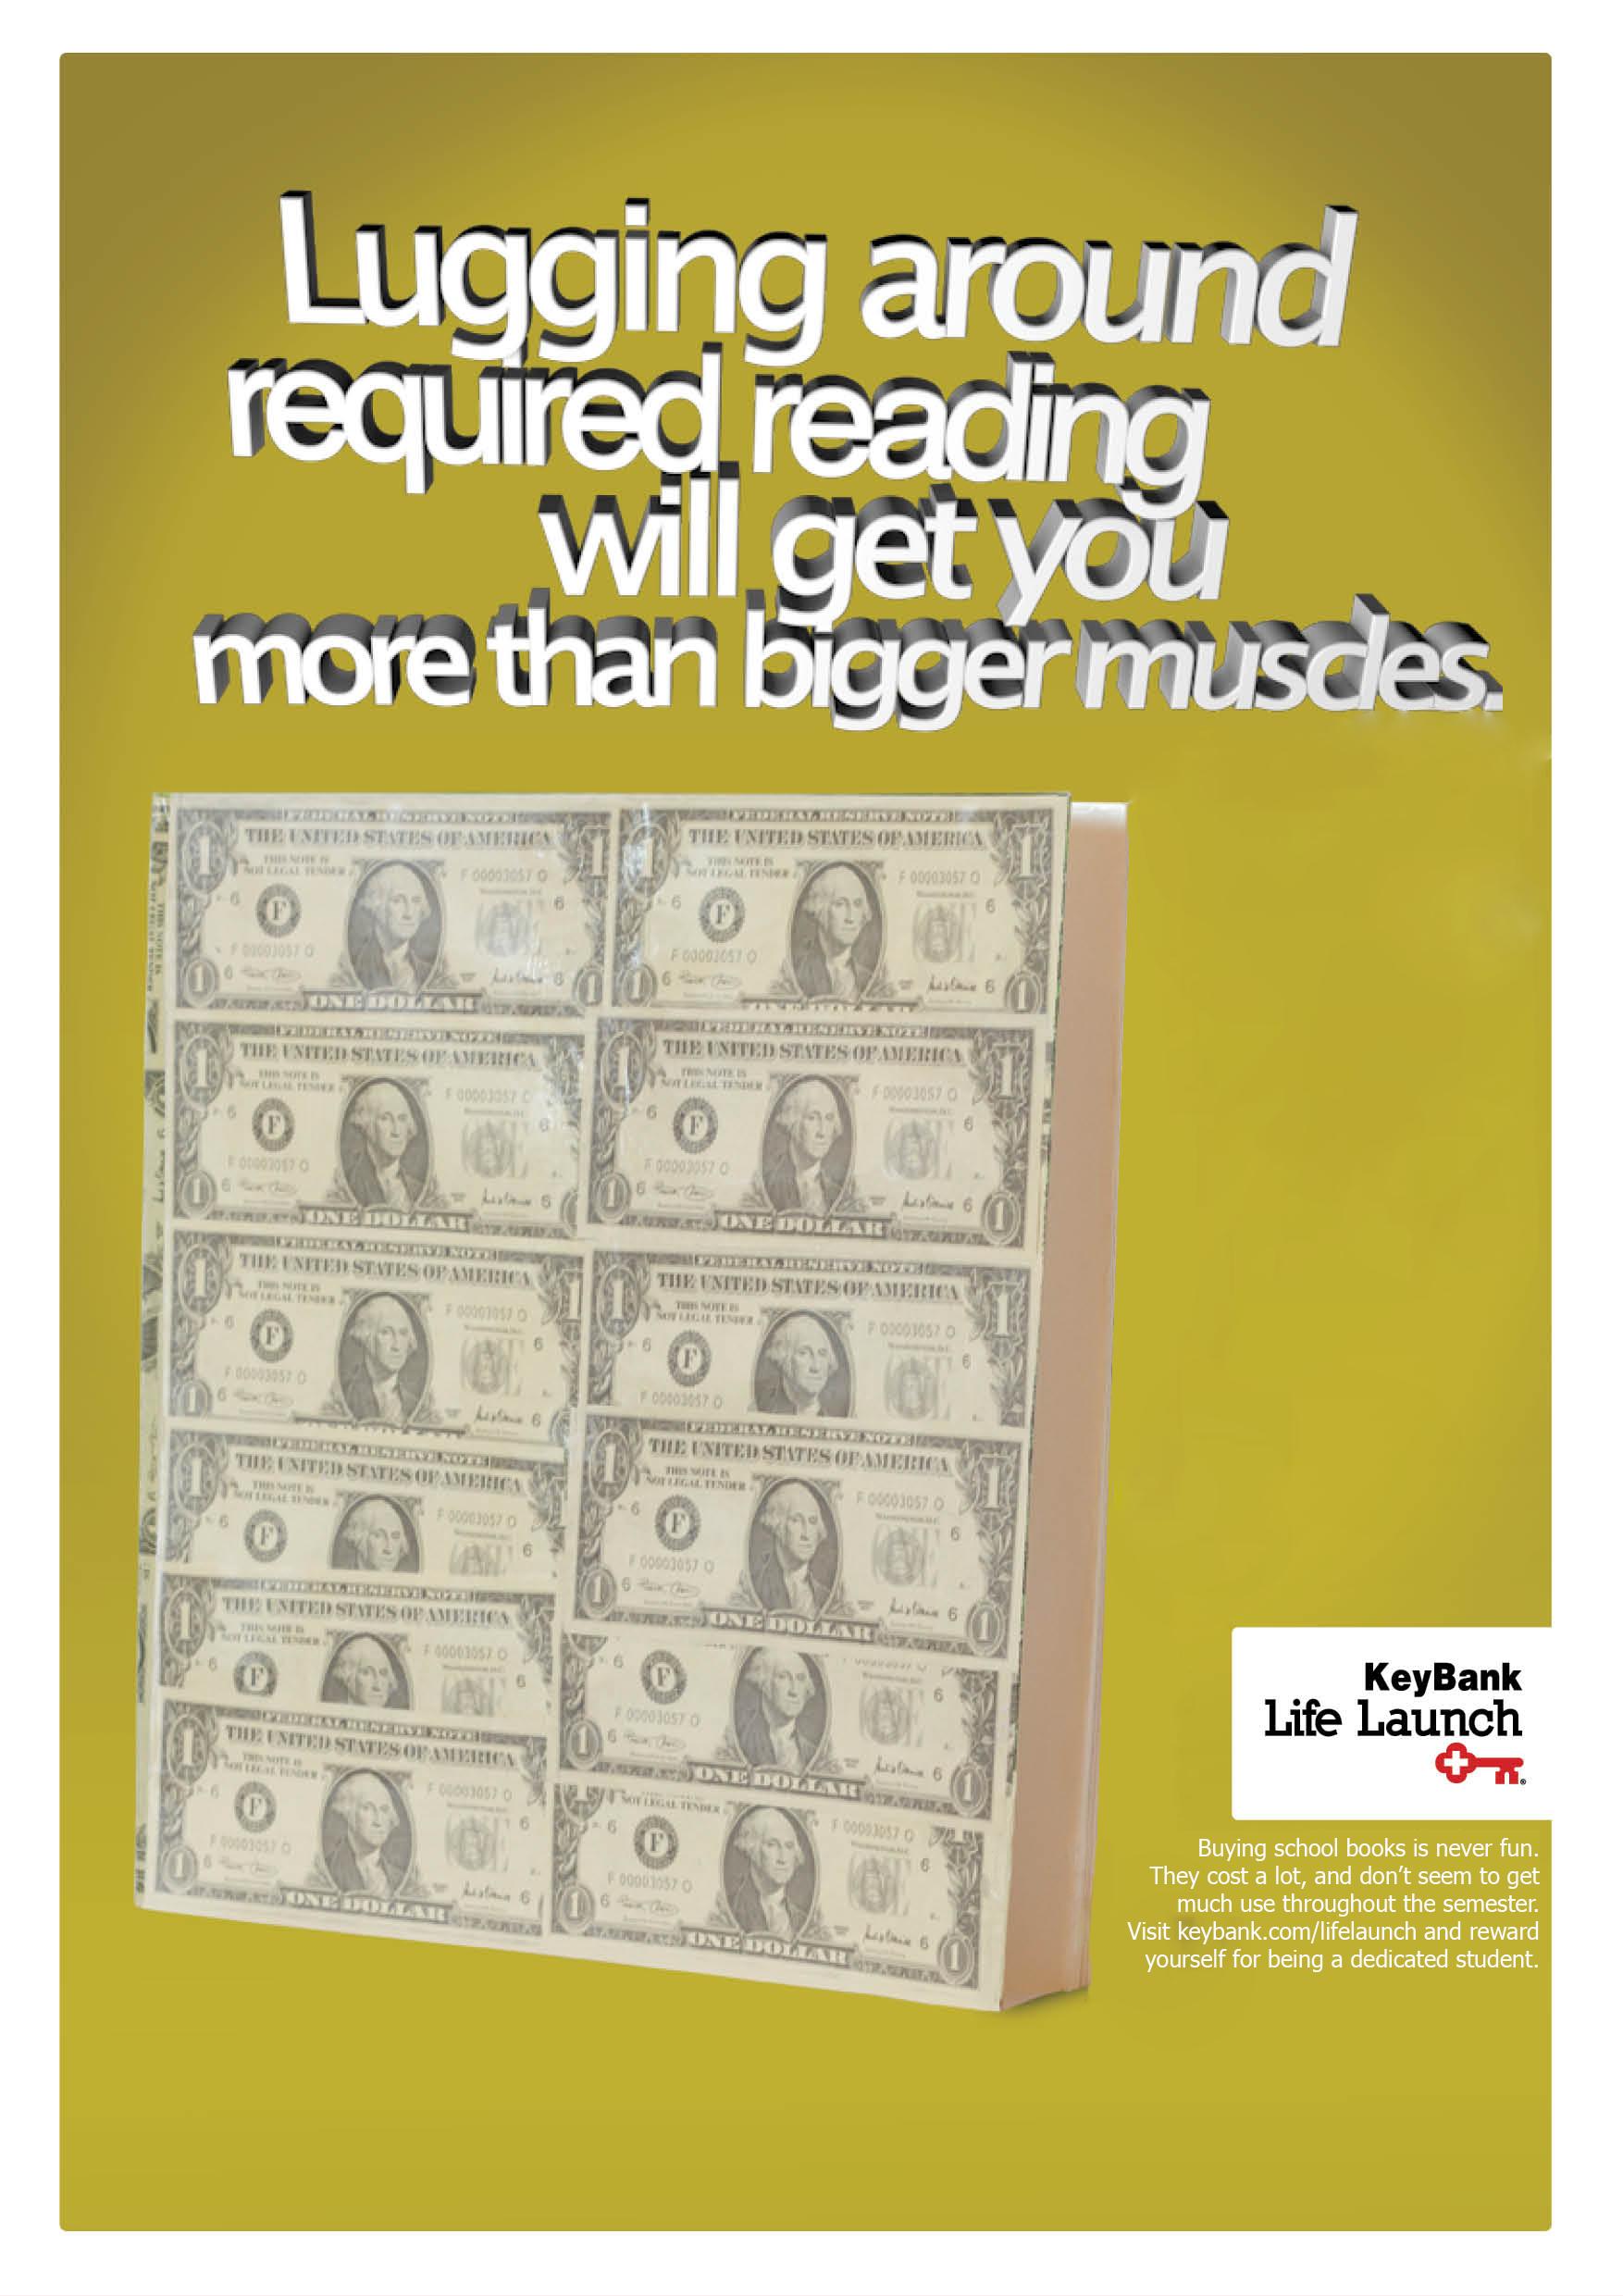 Key Bank Final Poster (Bookstore).png